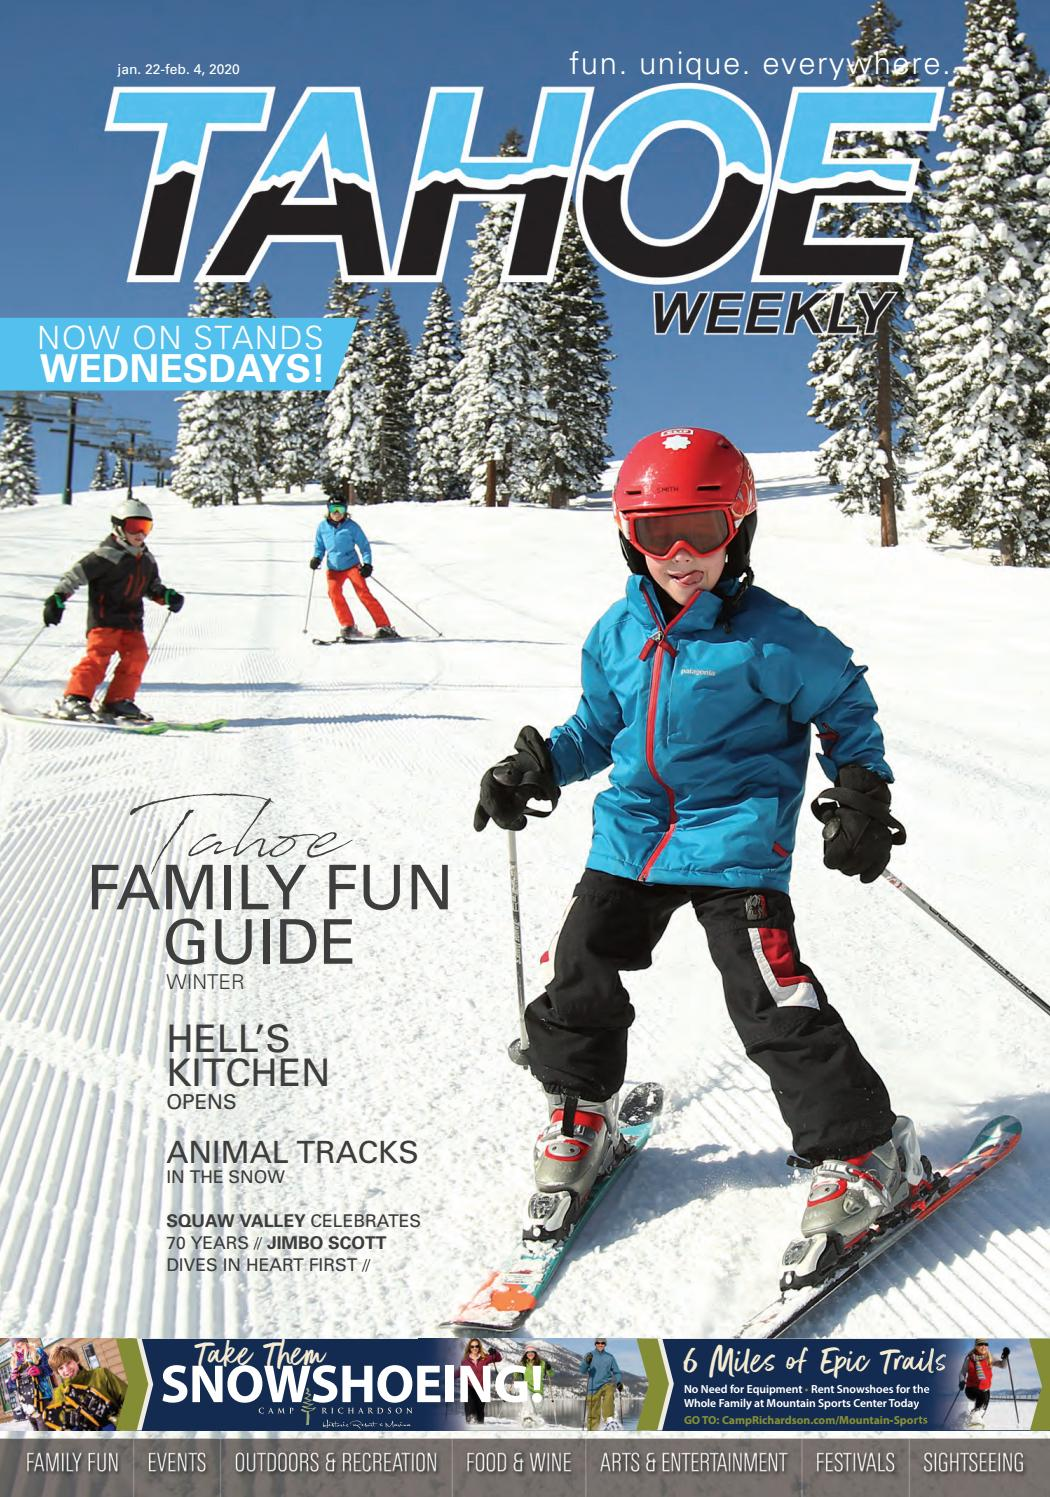 Heavenly sticker decal South Lake Tahoe snow snowboarding ski mountain bike hike